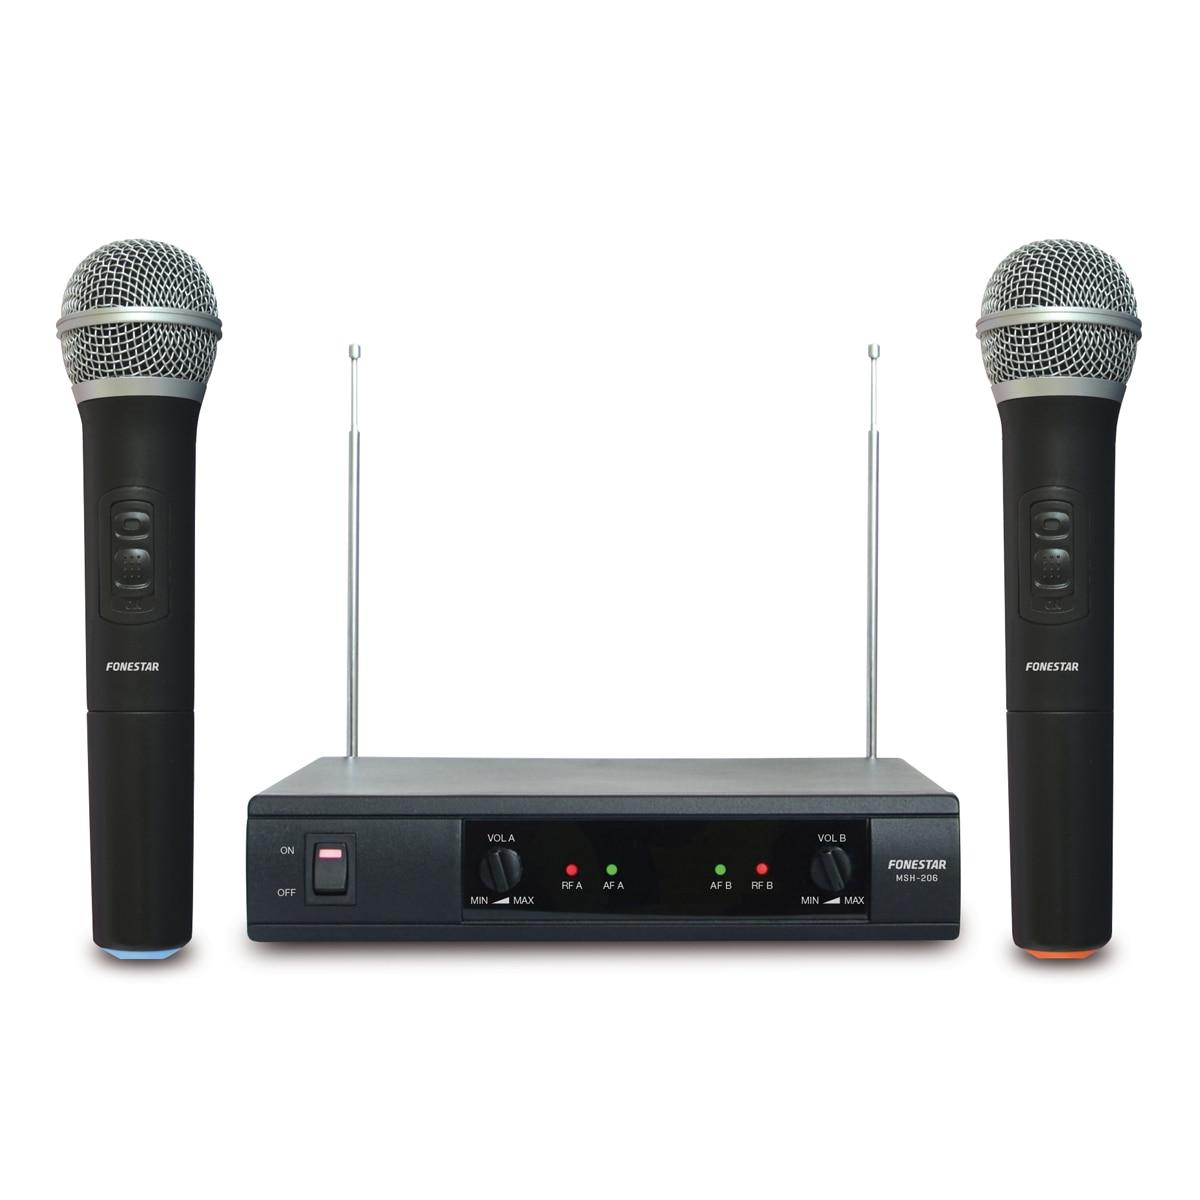 Microphones Inalambricos Double De Hand Fonestar Msh-206 VHF